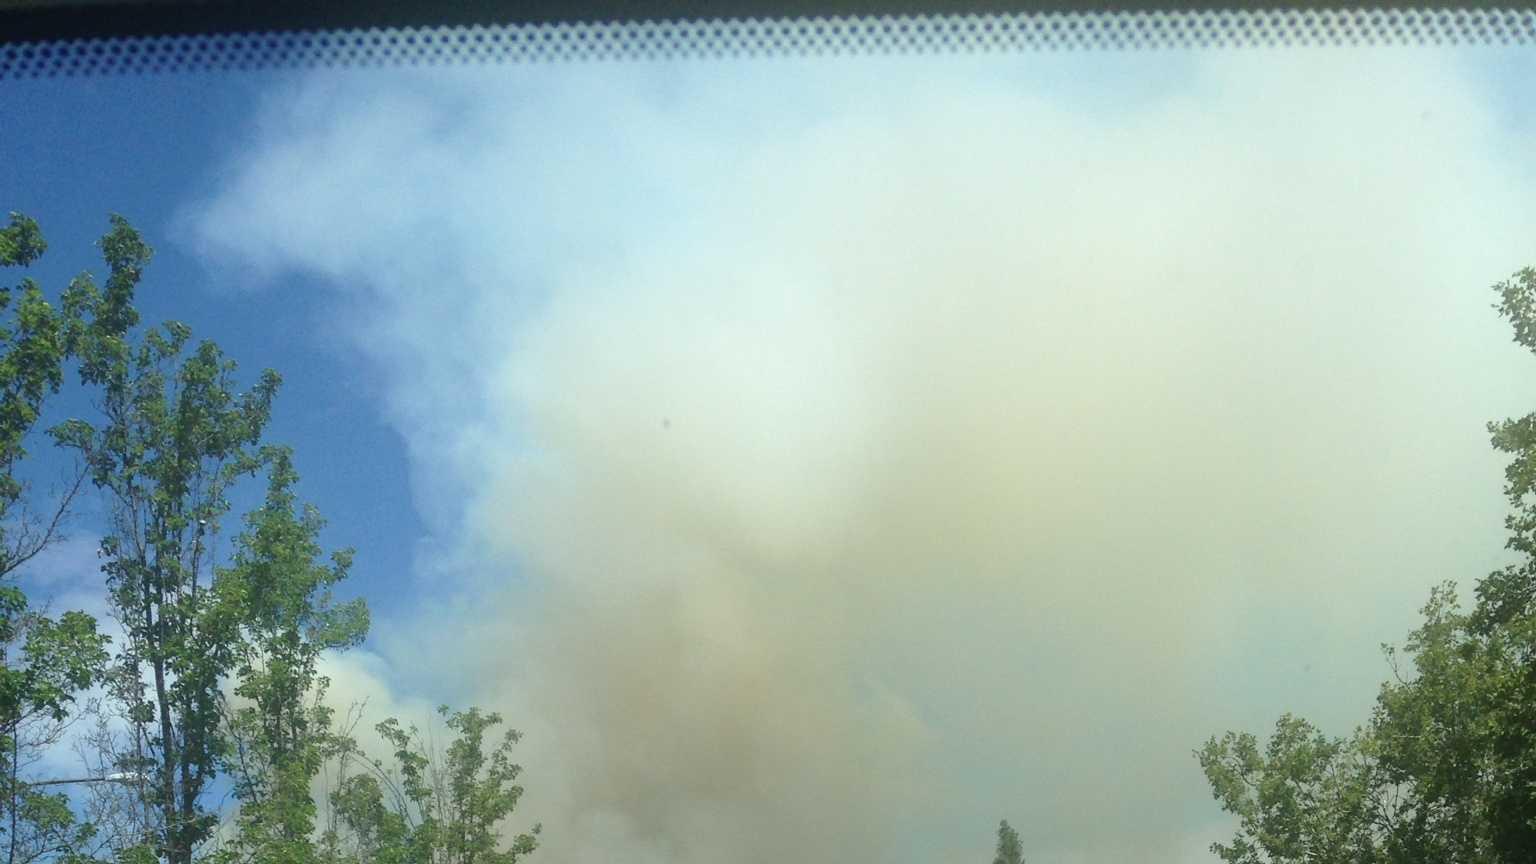 Grass fire burning near Danville. (July 7, 2015)